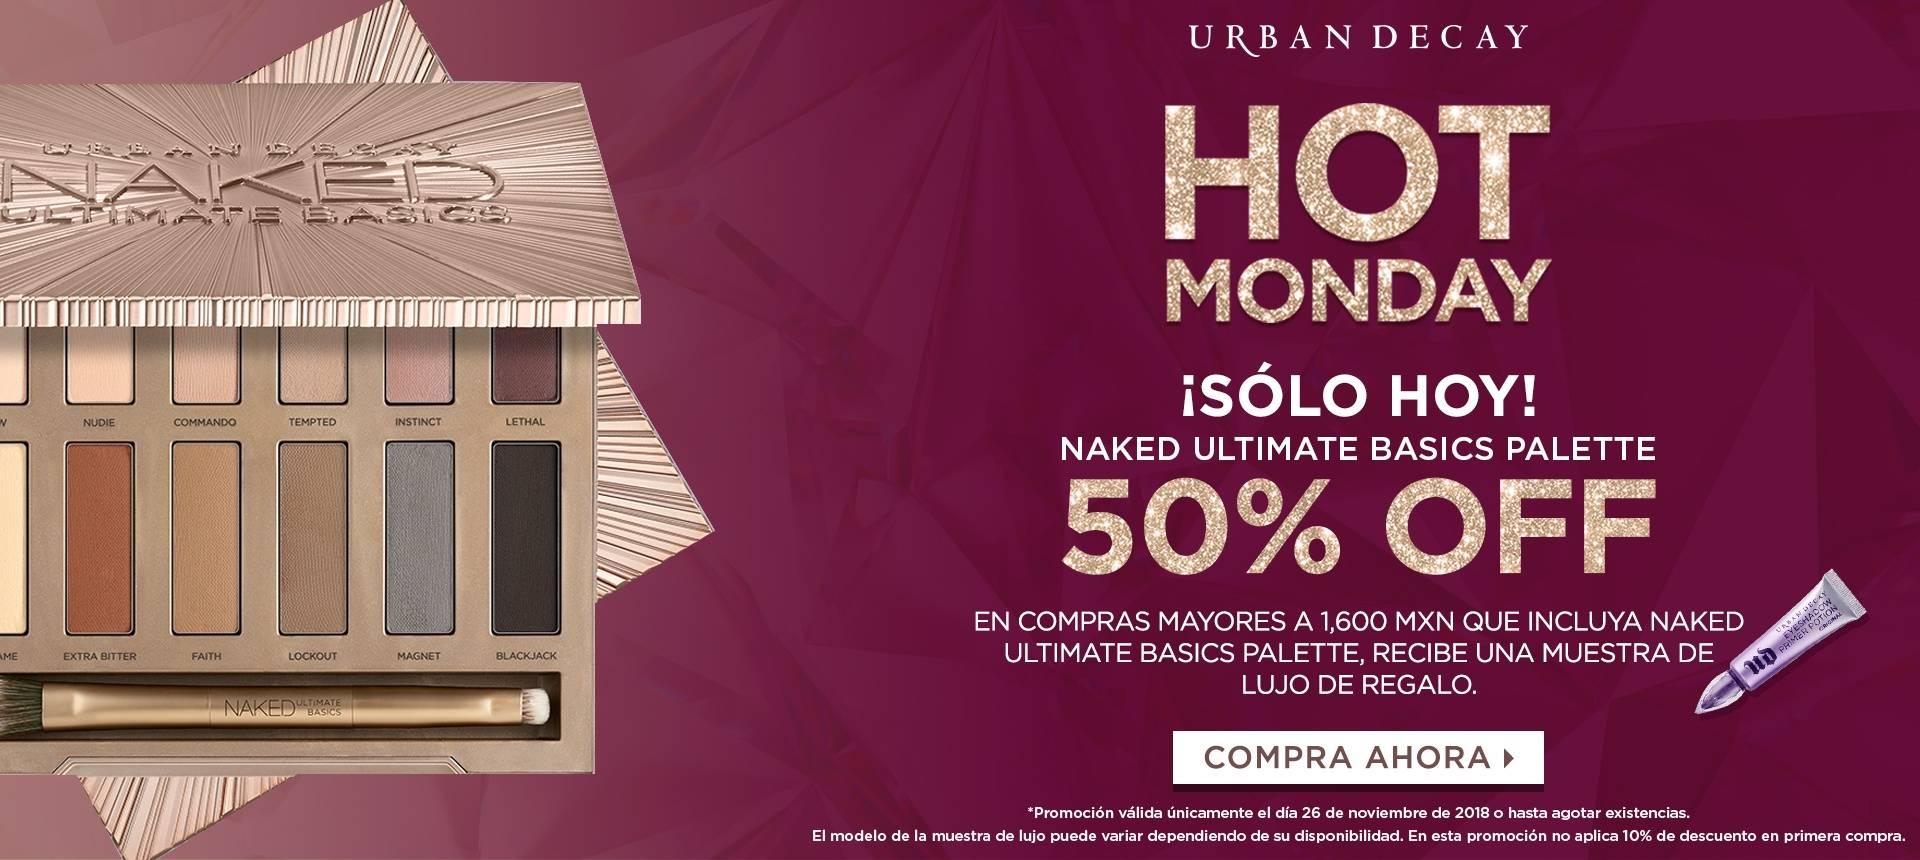 Cyber Monday en Urban decay: 50% en la paleta de sombras naked ultimate basics